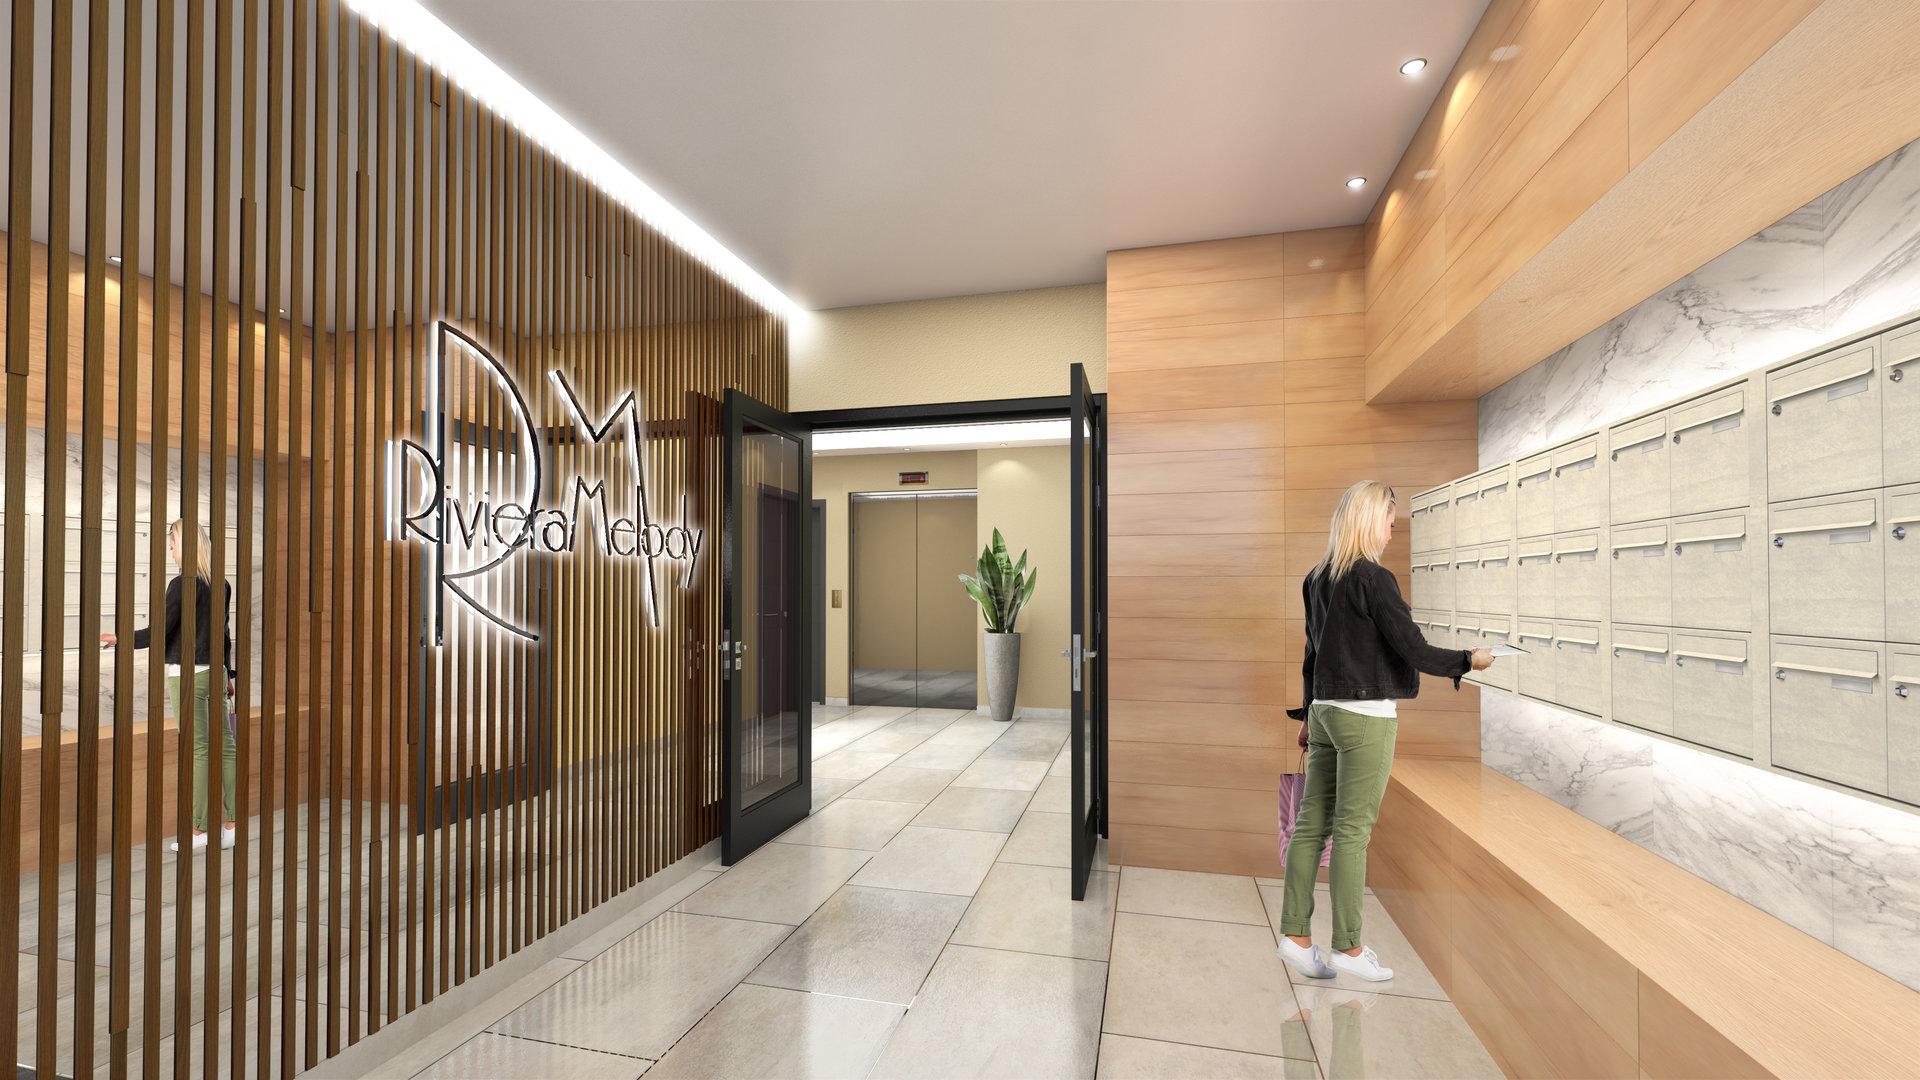 Juan-les-Pins Centre/New Building RIVIERA MELODY